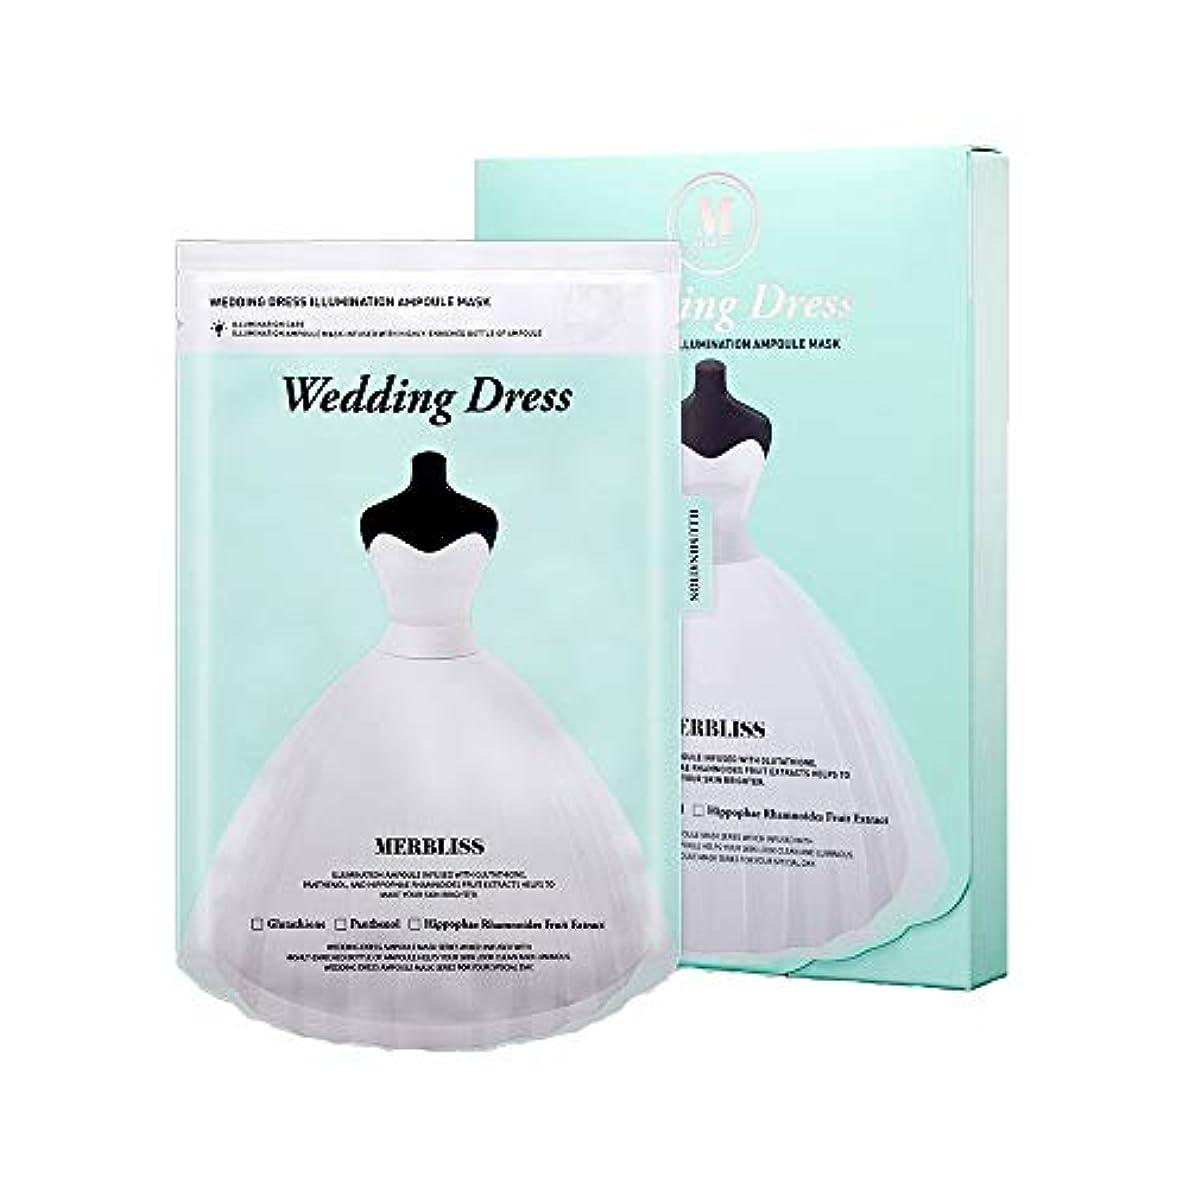 MERBLISS(モルブリス) ウェディングドレス イルミネーションマスク フェイスマスク シートマスク25ml 5枚入り